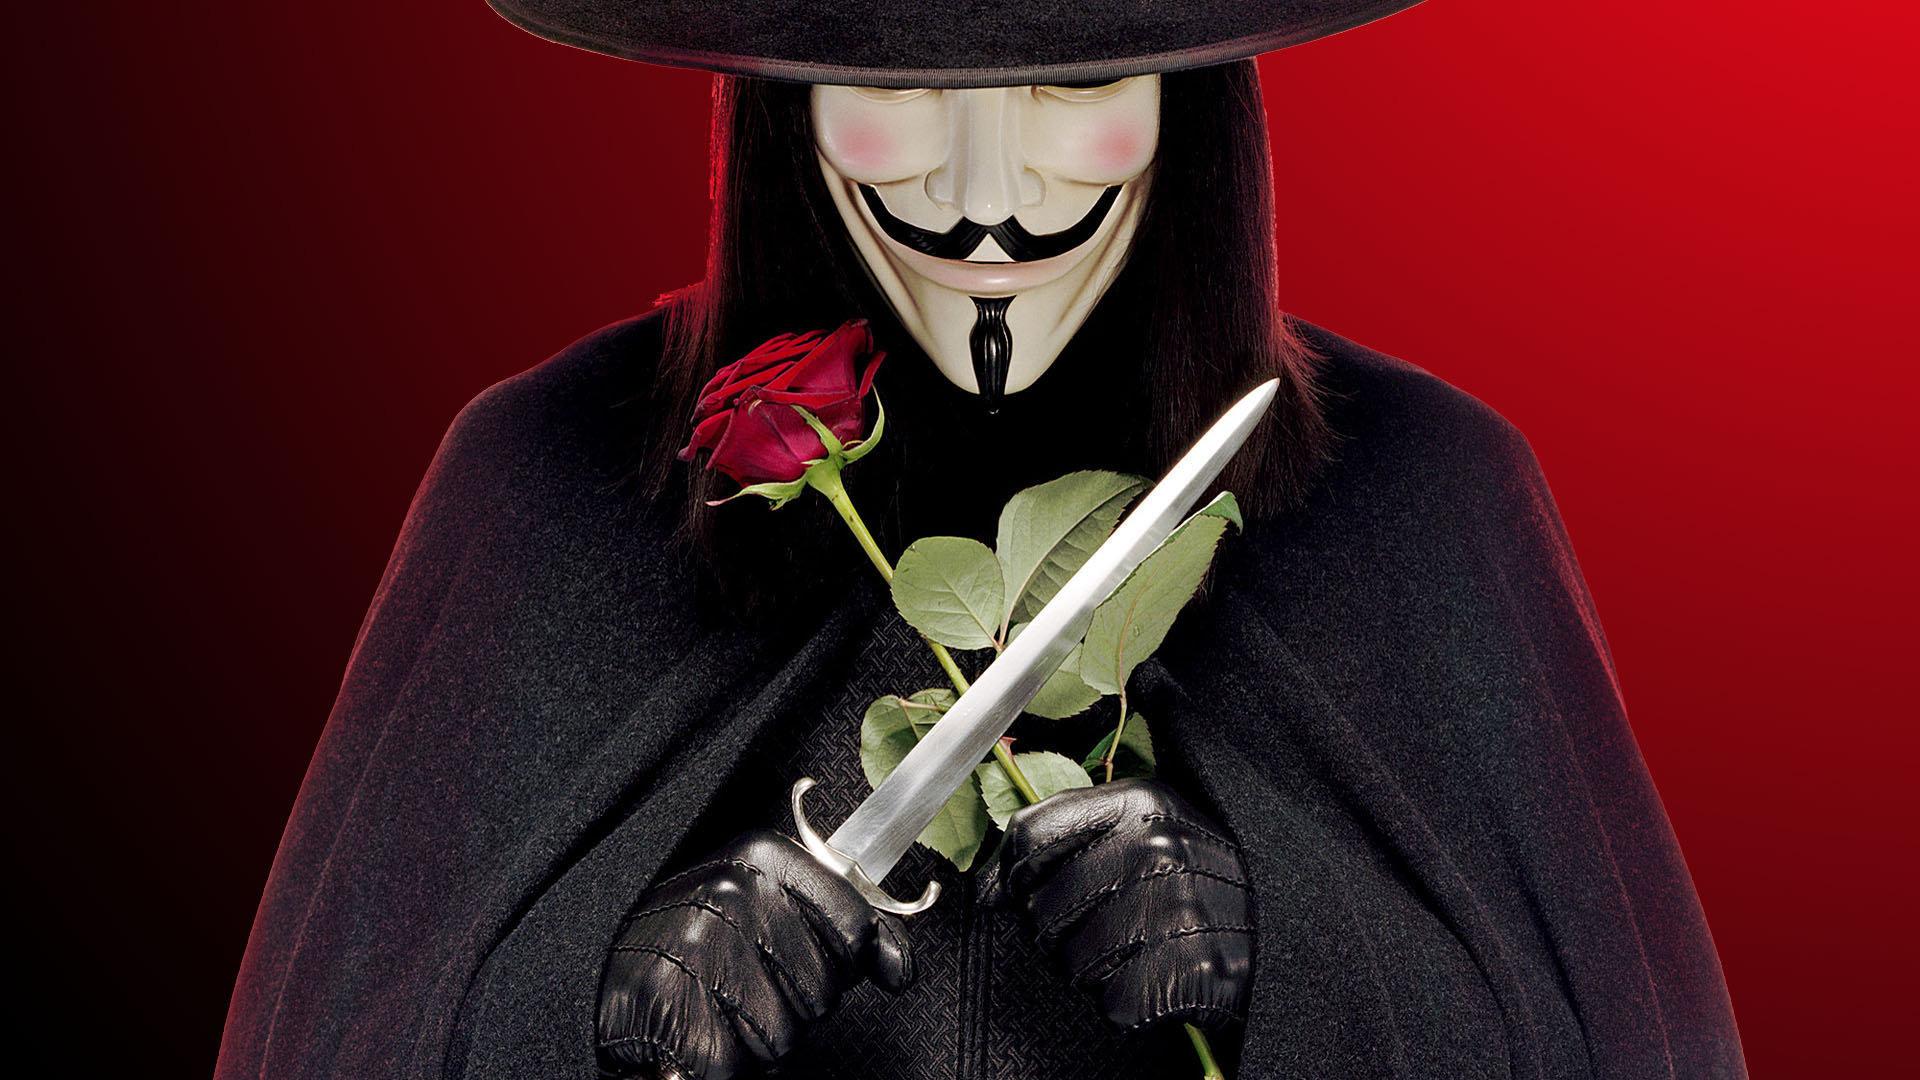 V For Vendetta Wallpaper Best Collection Of Vendetta Movie